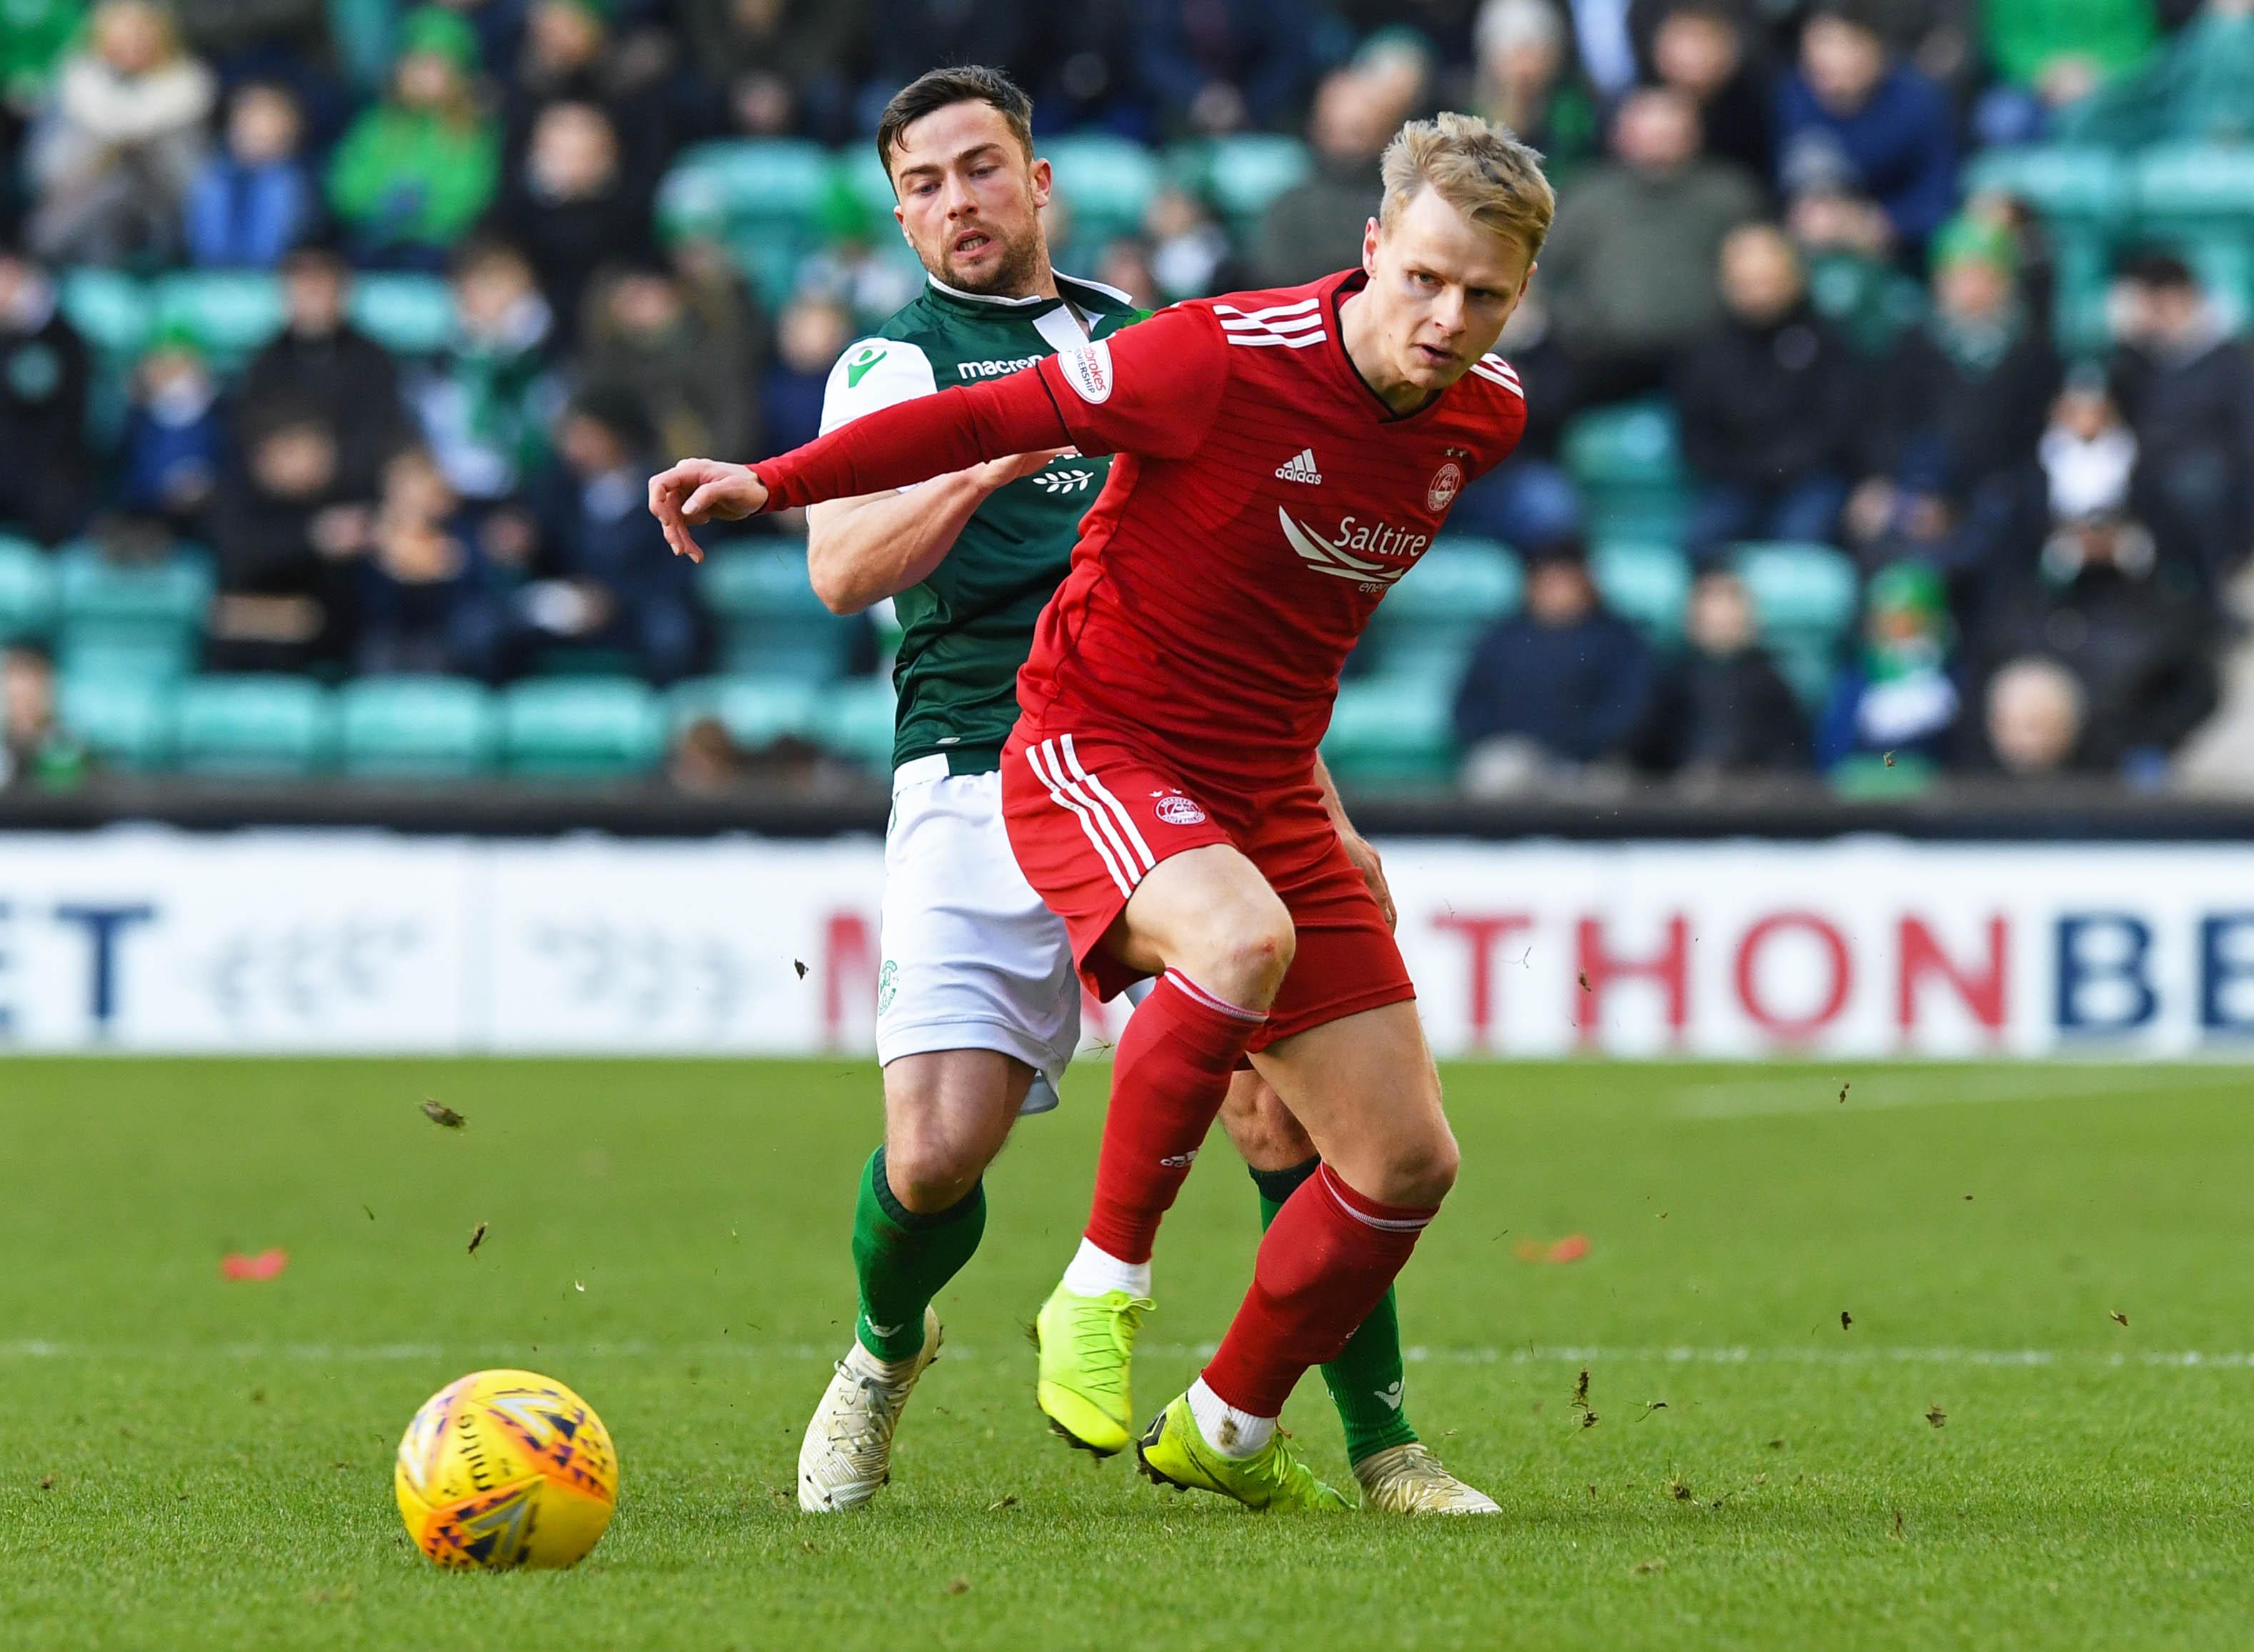 Aberdeen's Gary Mackay-Steven in action with Hibernian's Lewis Stevenson.